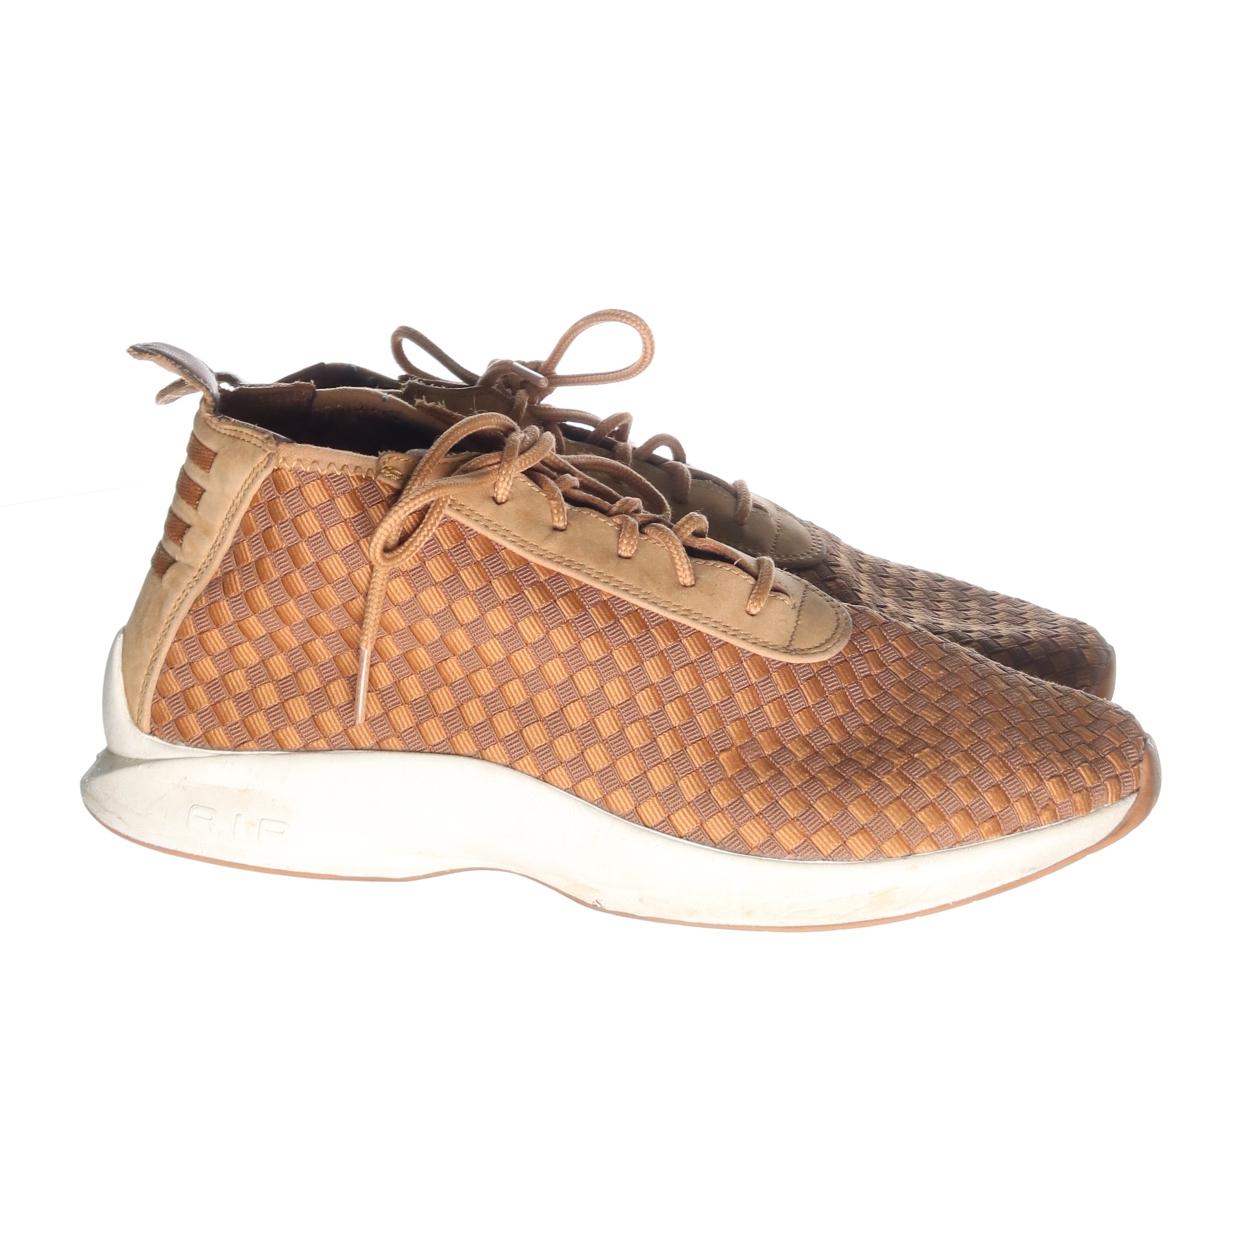 check out 9e121 2775e Skor (Brun) från Nike   Sellpy.se